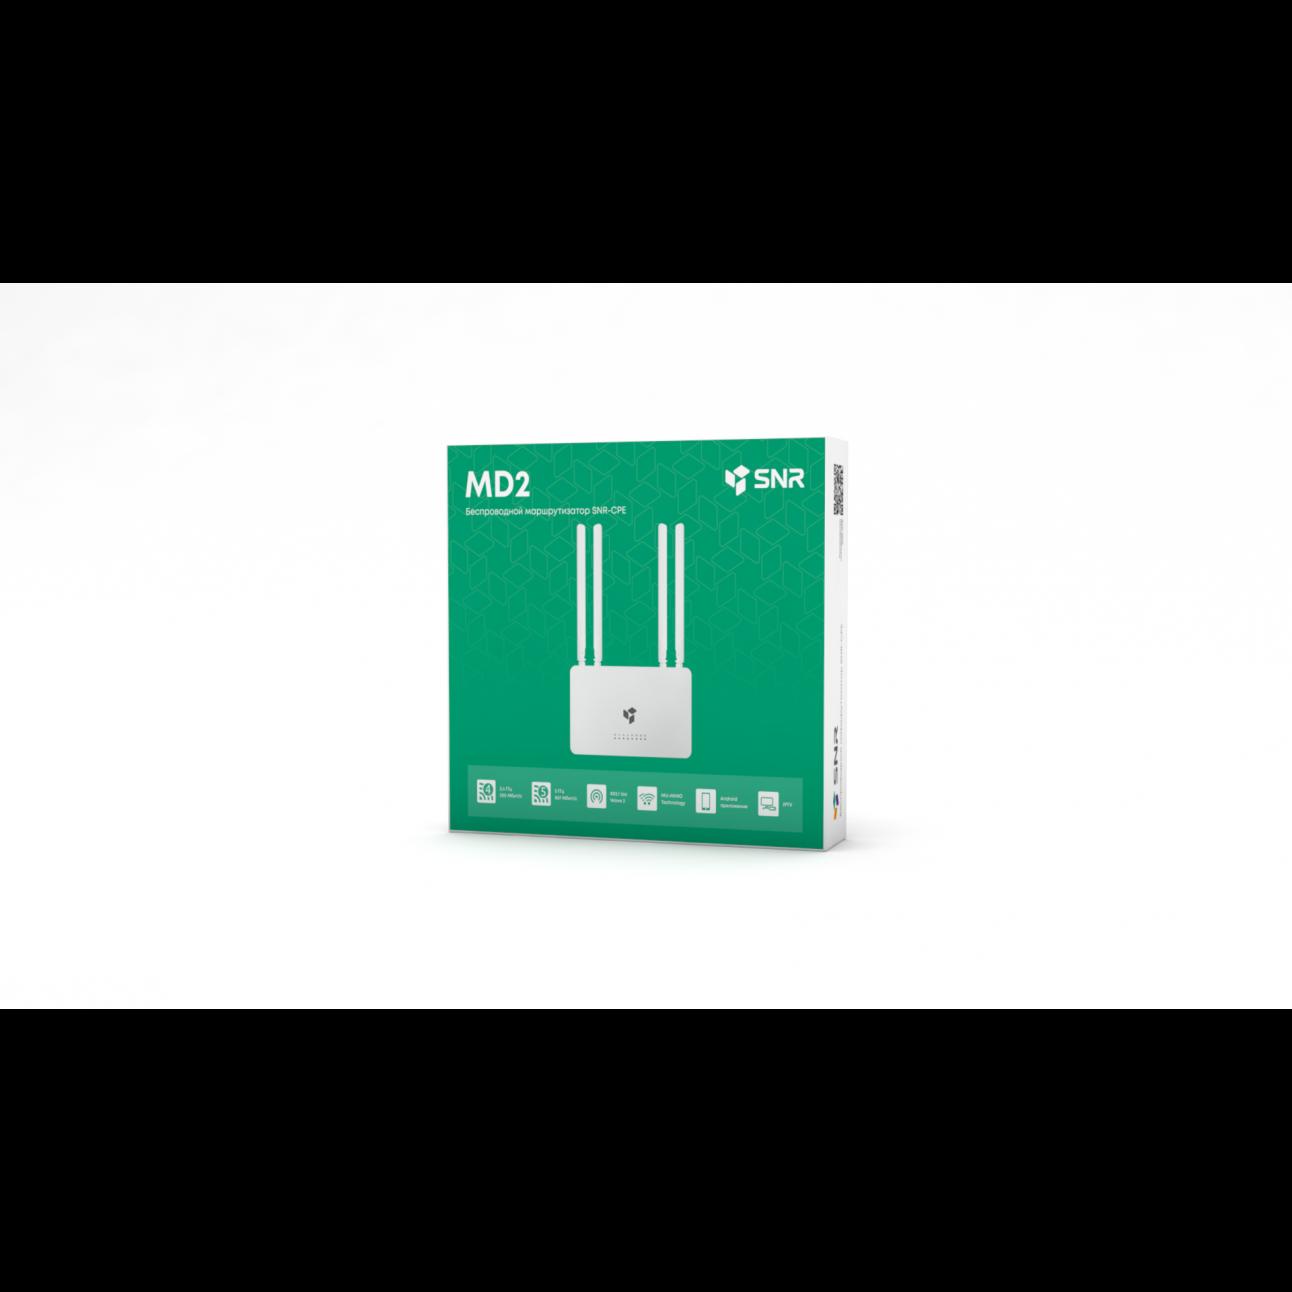 Беспроводной маршрутизатор SNR-CPE-MD2, 802.11a/b/g/n/ac, 5xFE RJ45